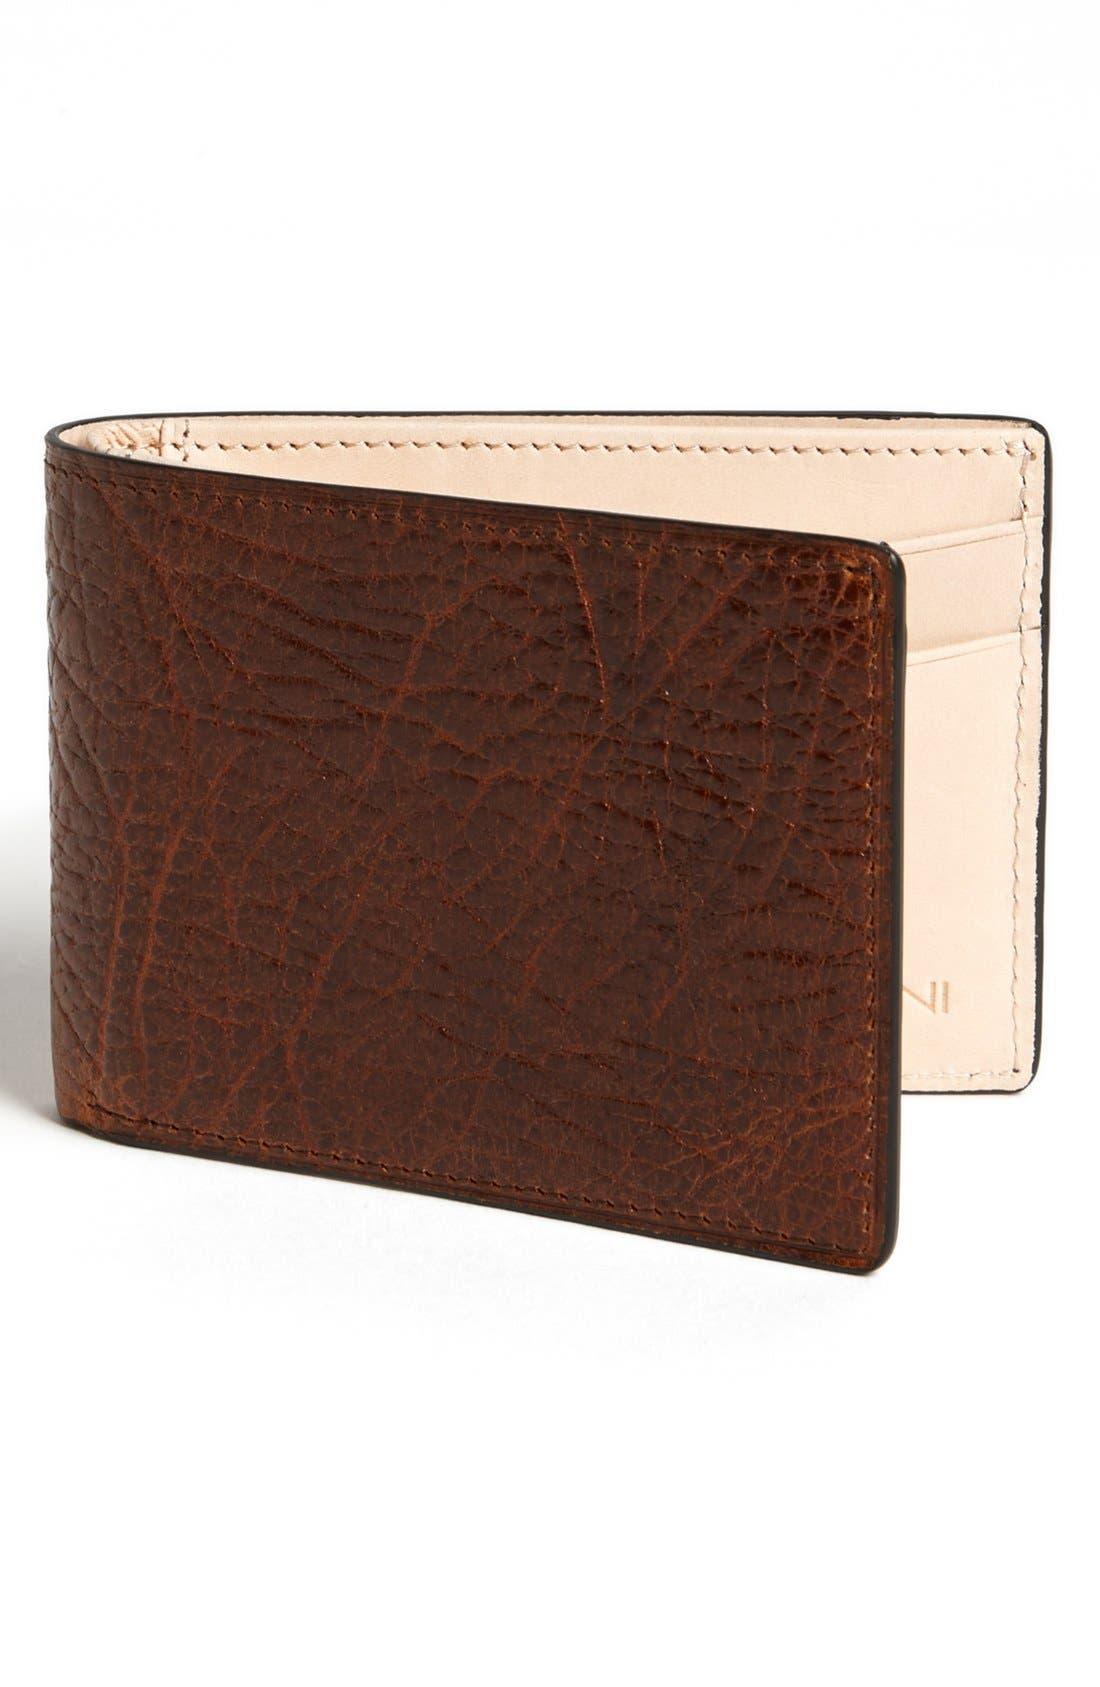 Alternate Image 1 Selected - Boconi 'Mathews' Wallet